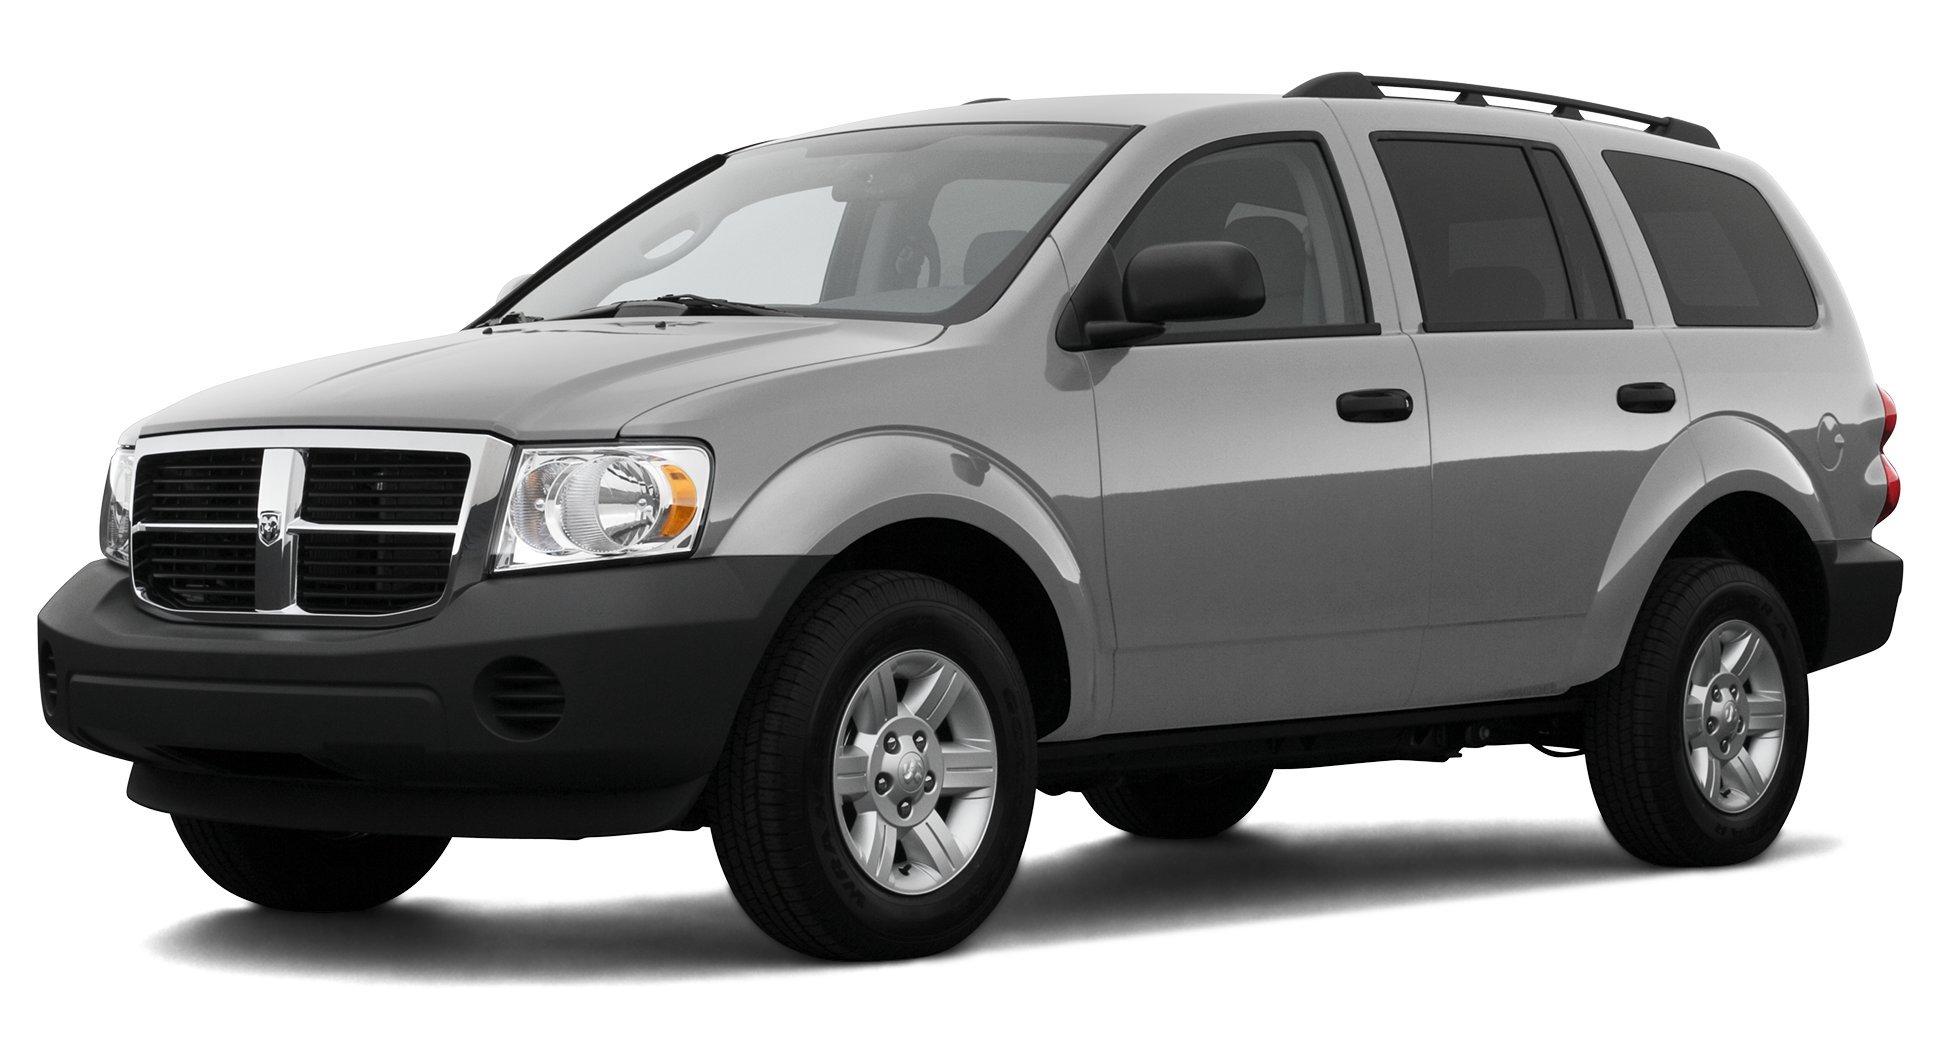 2007 Ford Explorer Sport Trac Reviews Images And Specs Suspension Dodge Durango Sxt 2 Wheel Drive 4 Door